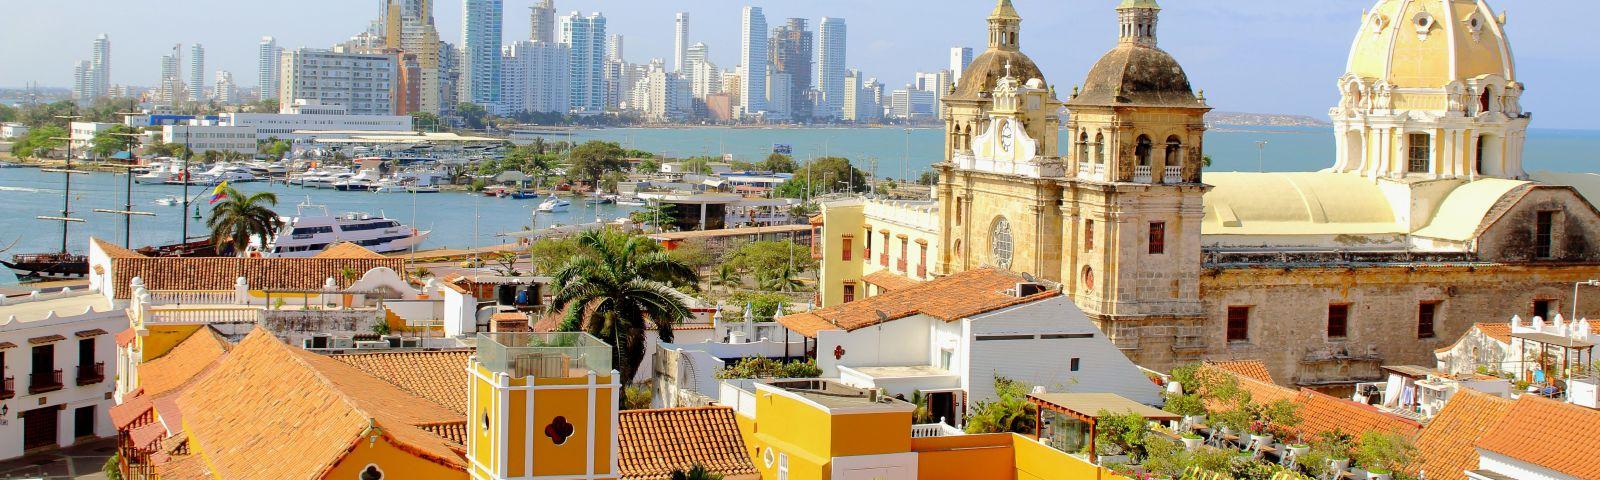 Panorama von Cartagena in Kolumbien